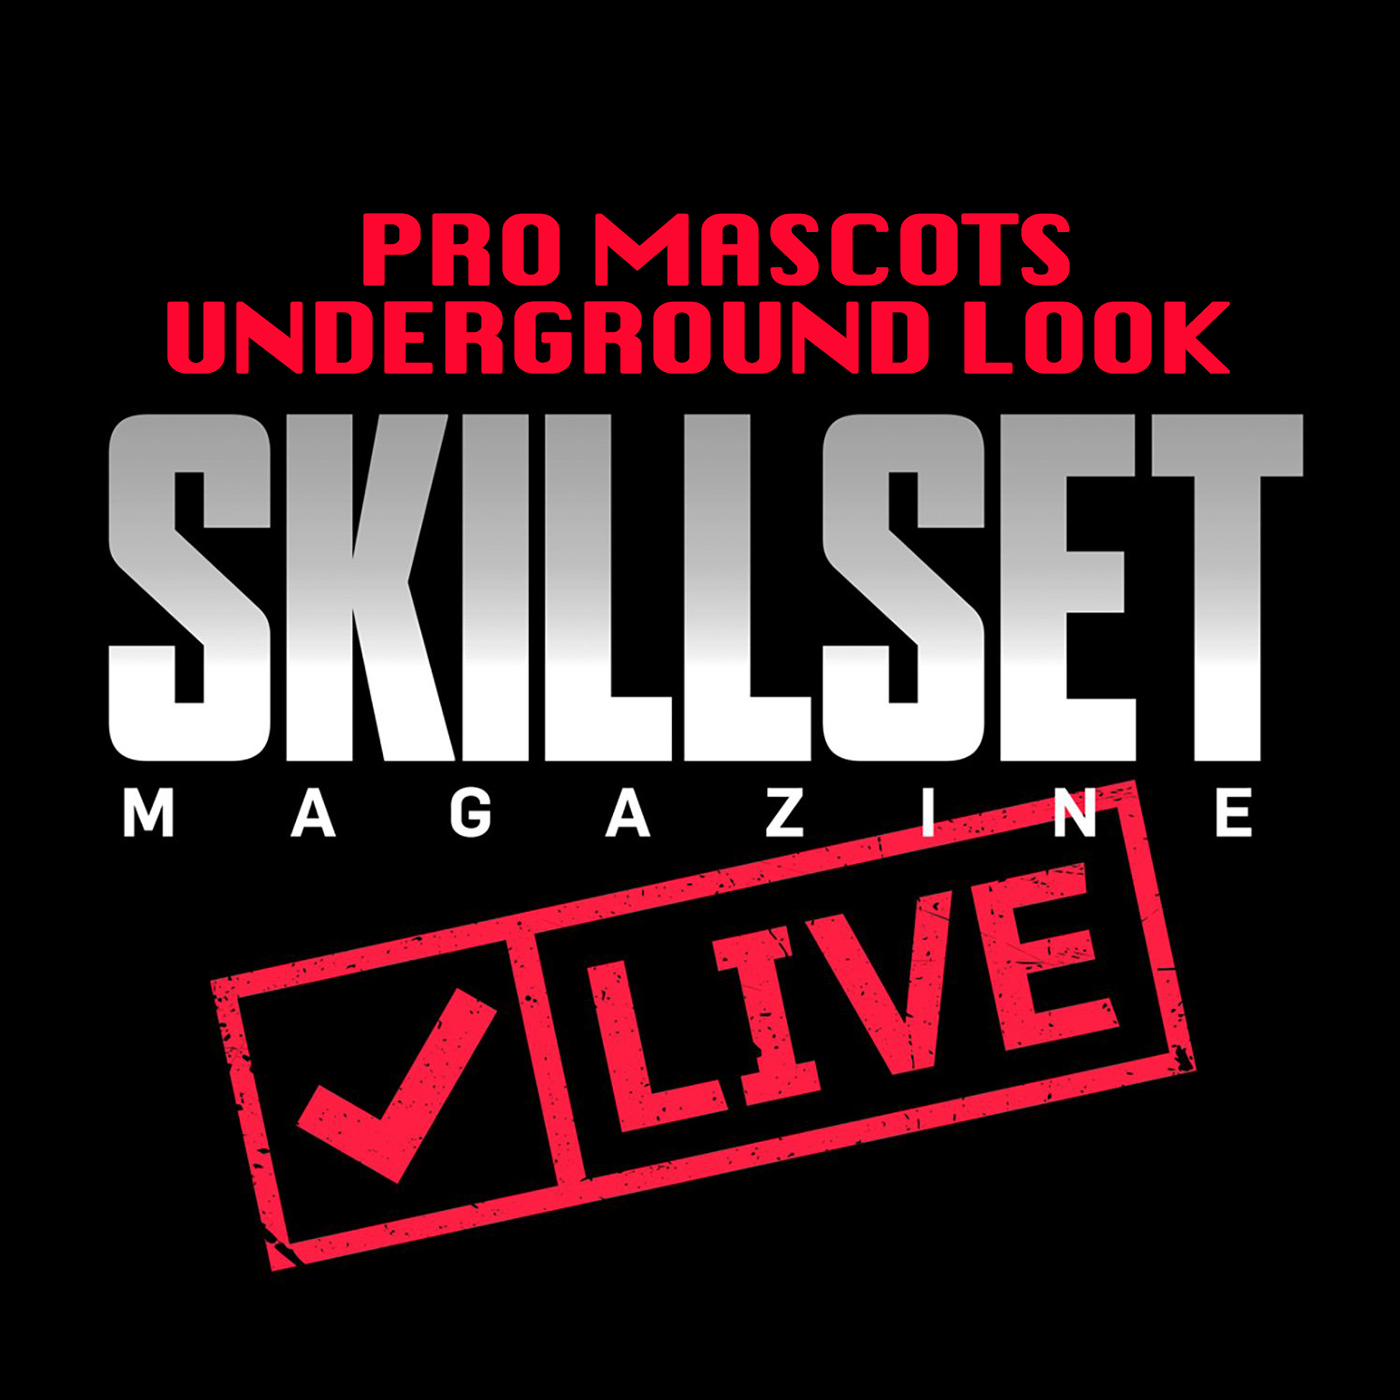 Skillset_Live31